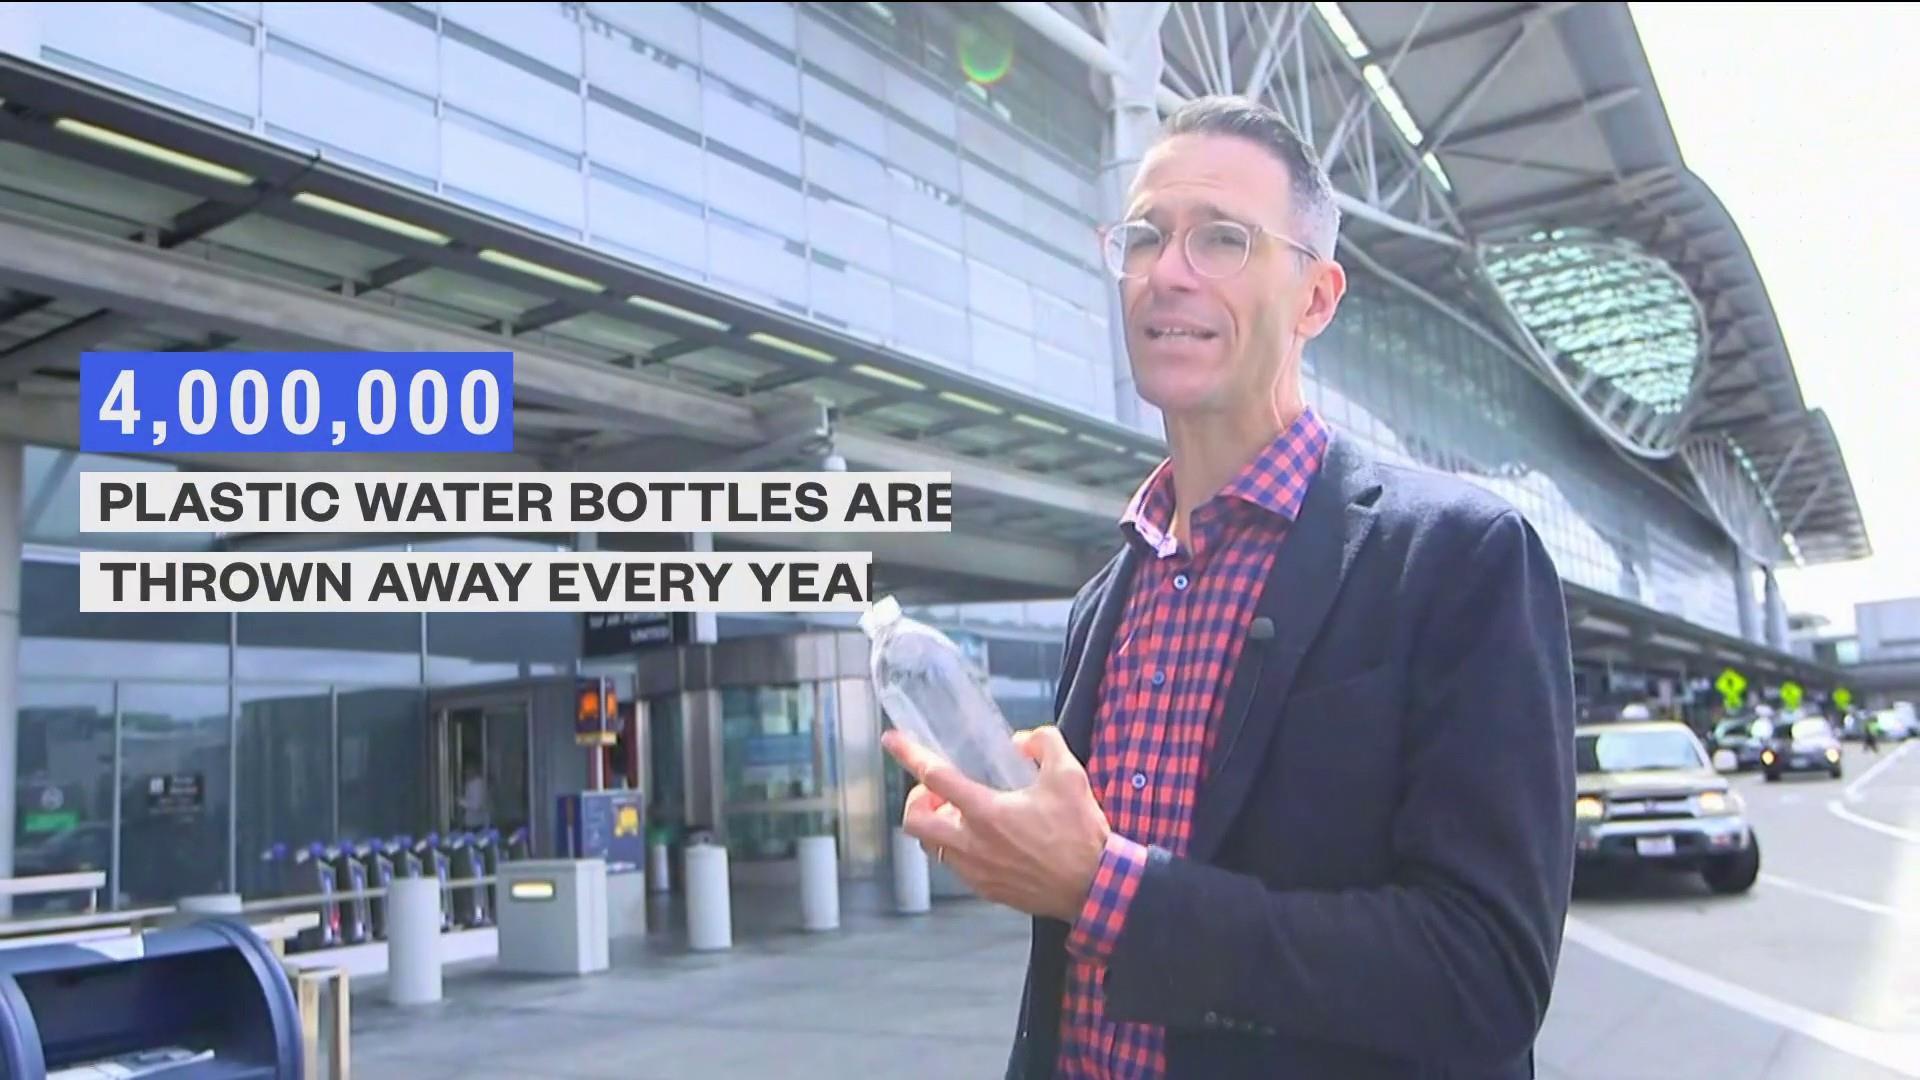 San Francisco airport bans single-use plastic bottles